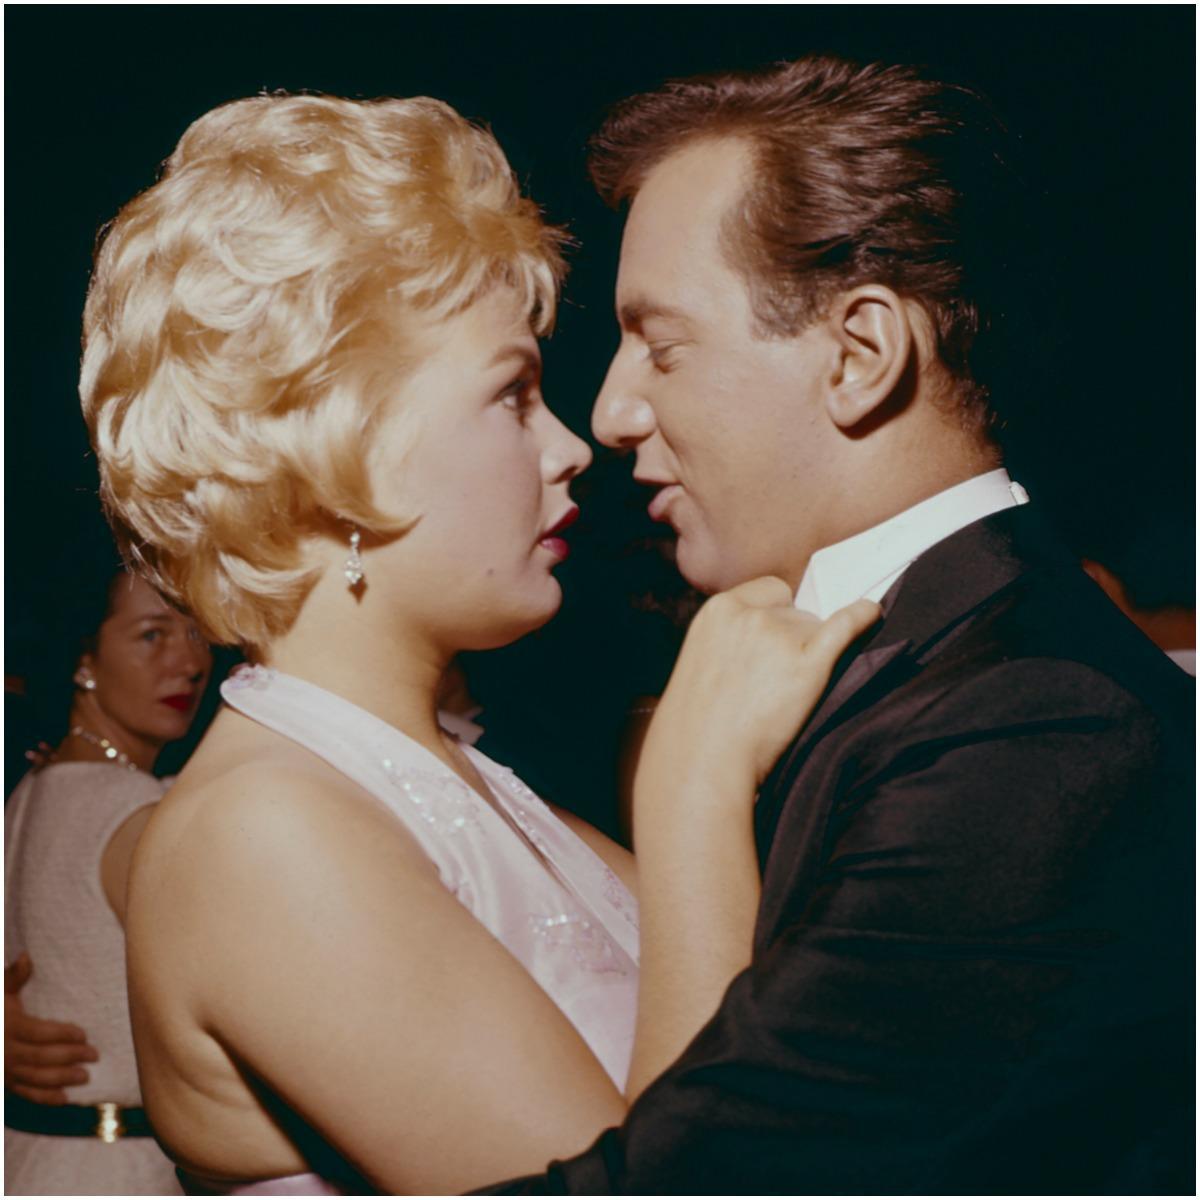 Sandra Dee and her husband Bobby Darin